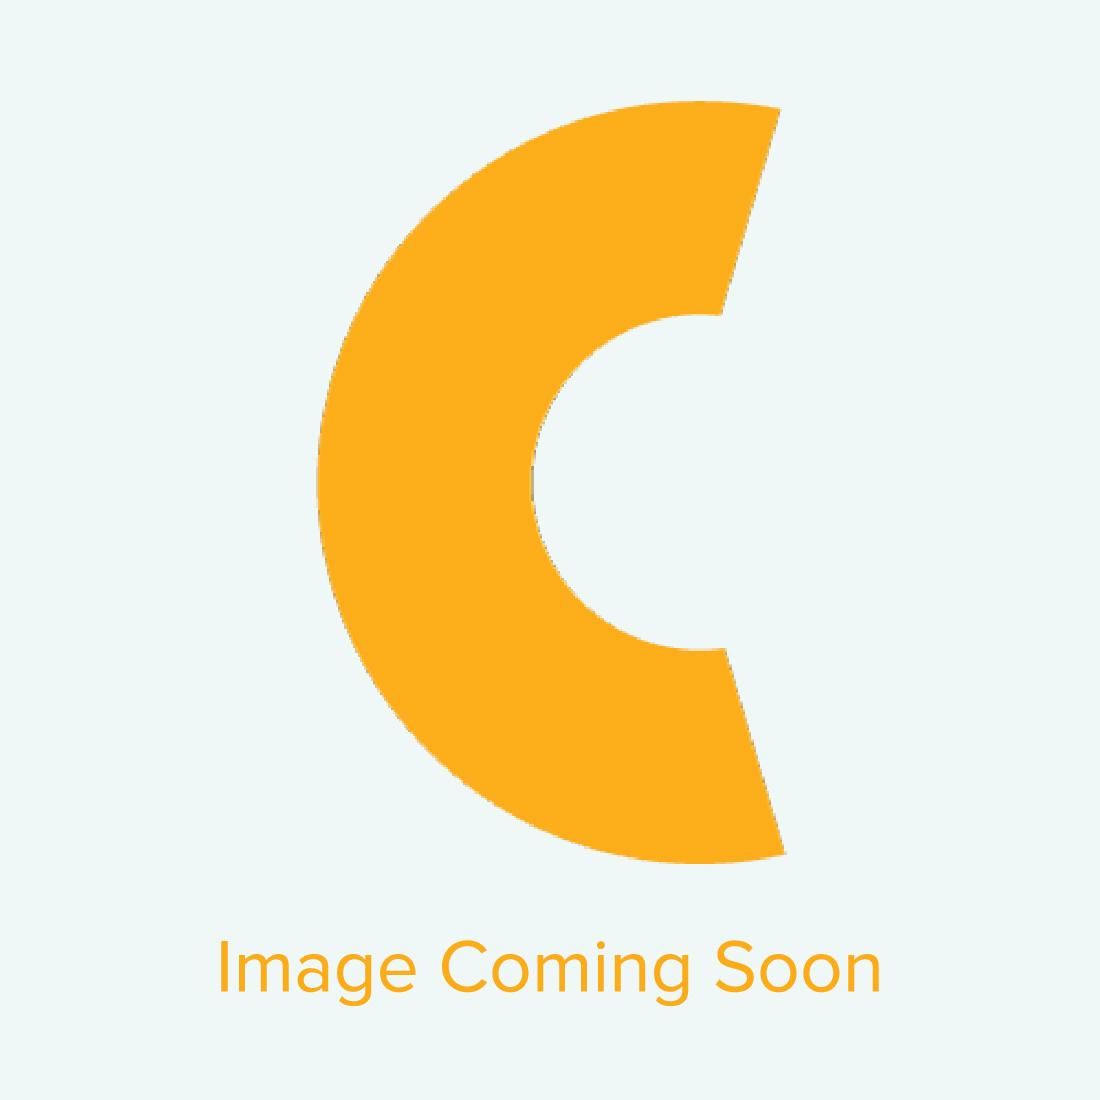 "Premier Ceramic Sublimation Tile - 6"" x 6"" - Matte - 24/case - OVERSTOCK"